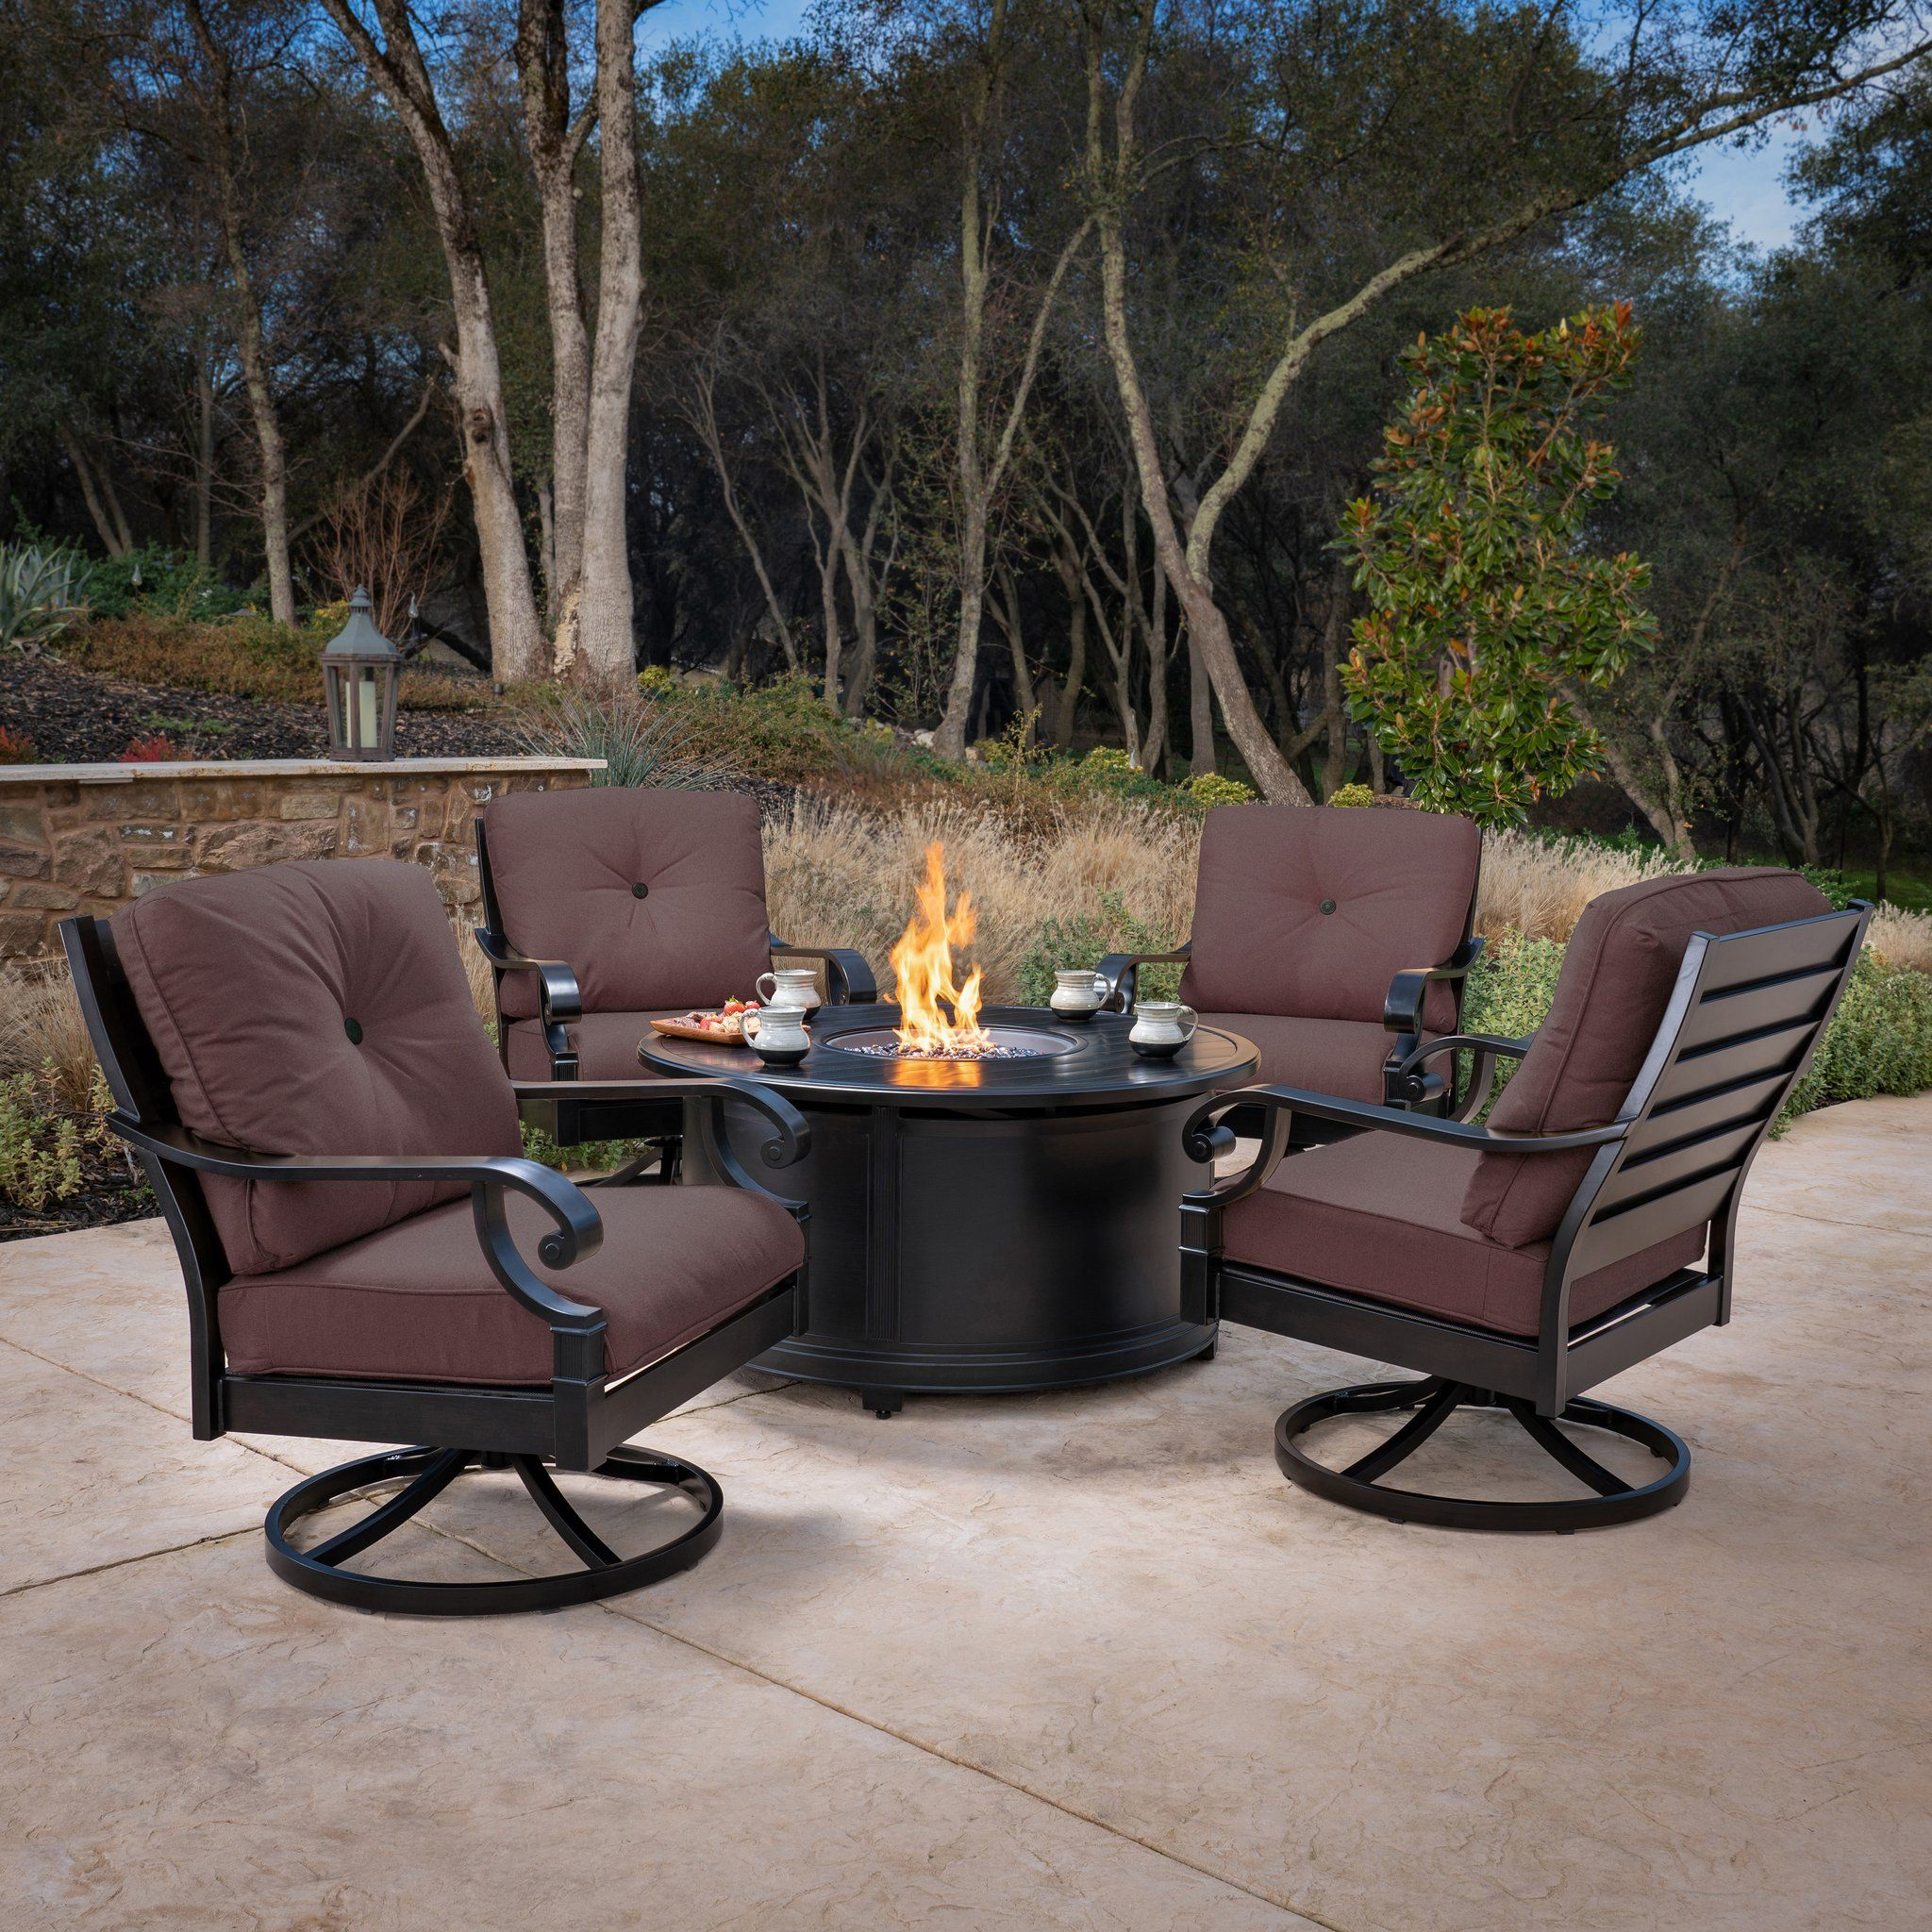 Verena 5 Piece Fire Chat Set Costco Patio Furniture Outdoor Retreat Verena